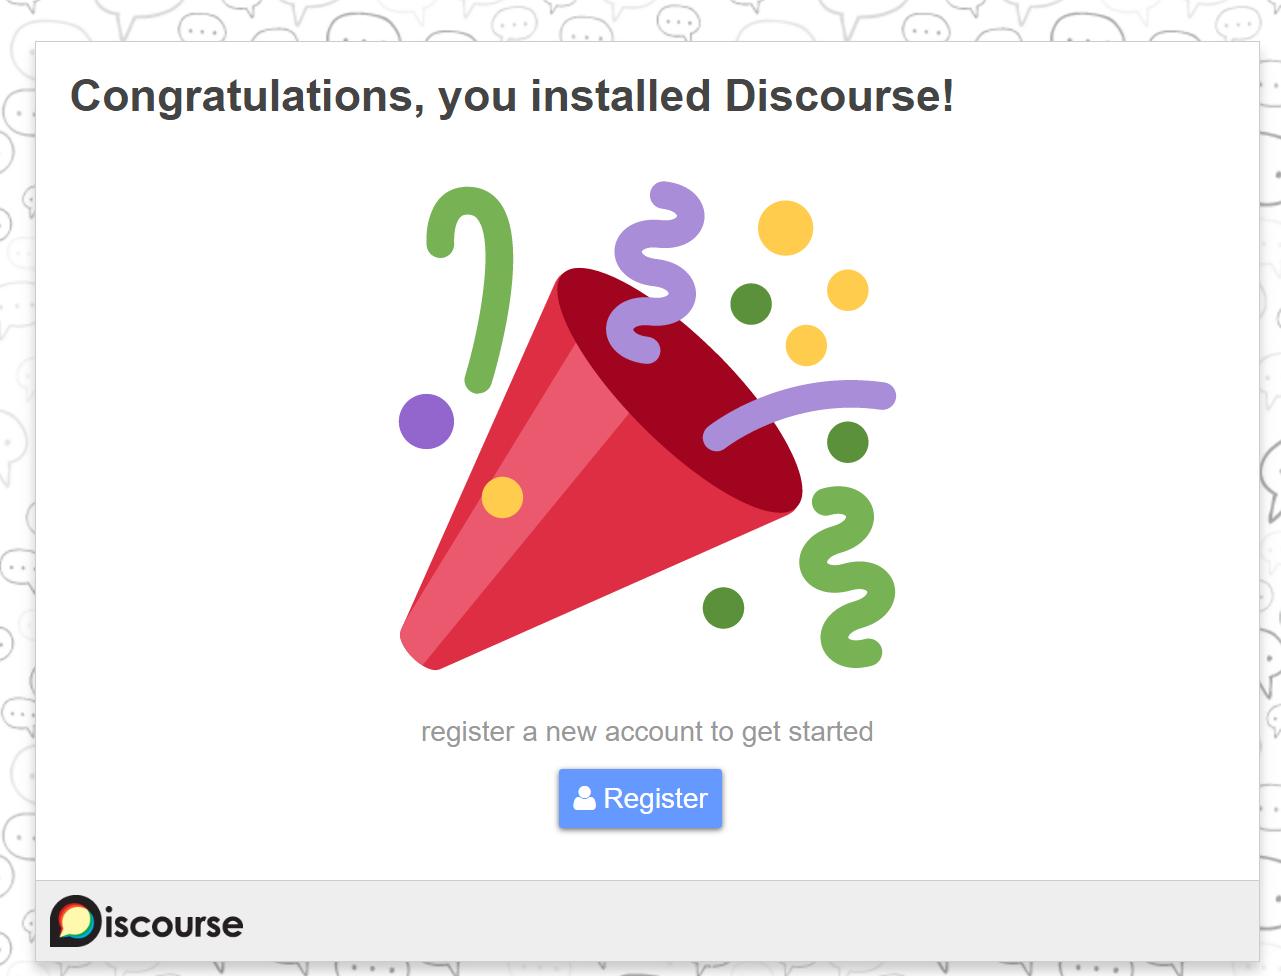 Discourse-Glückwunsch-Bildschirm